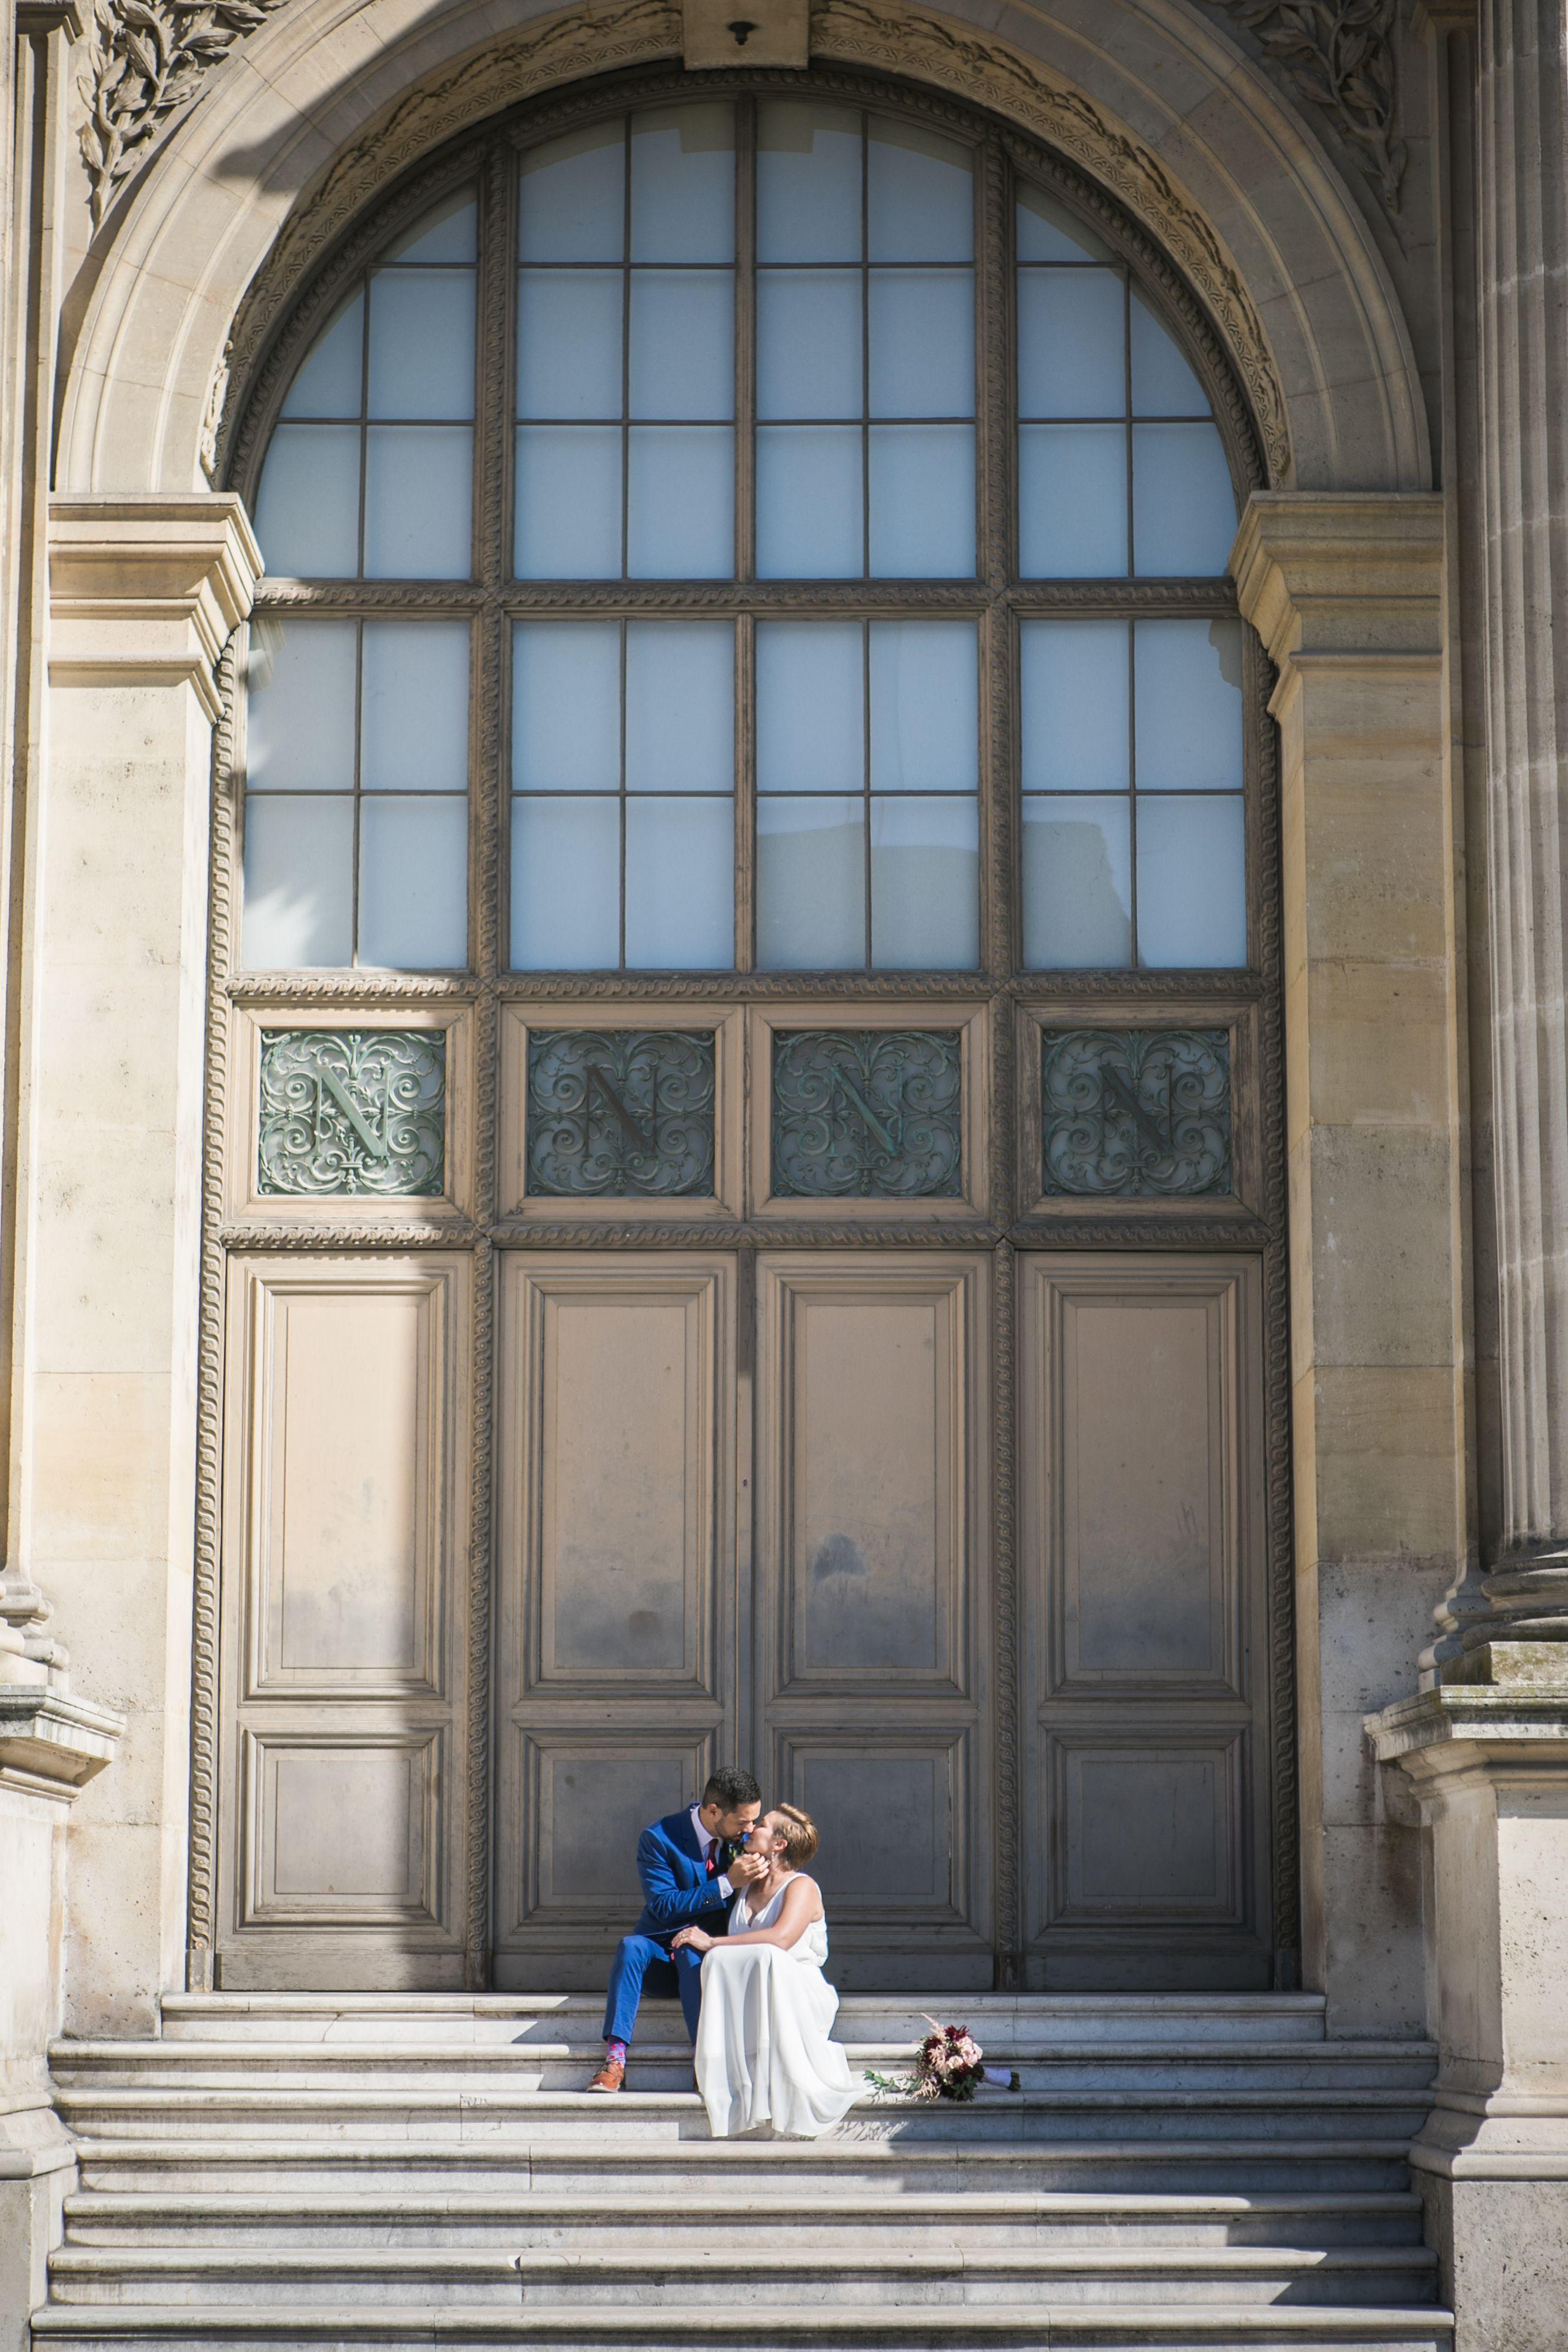 Pattie Anthony S Romantic Elopement In Paris Peach Perfect Weddings Paris Elopement Elope Elopement Ceremony